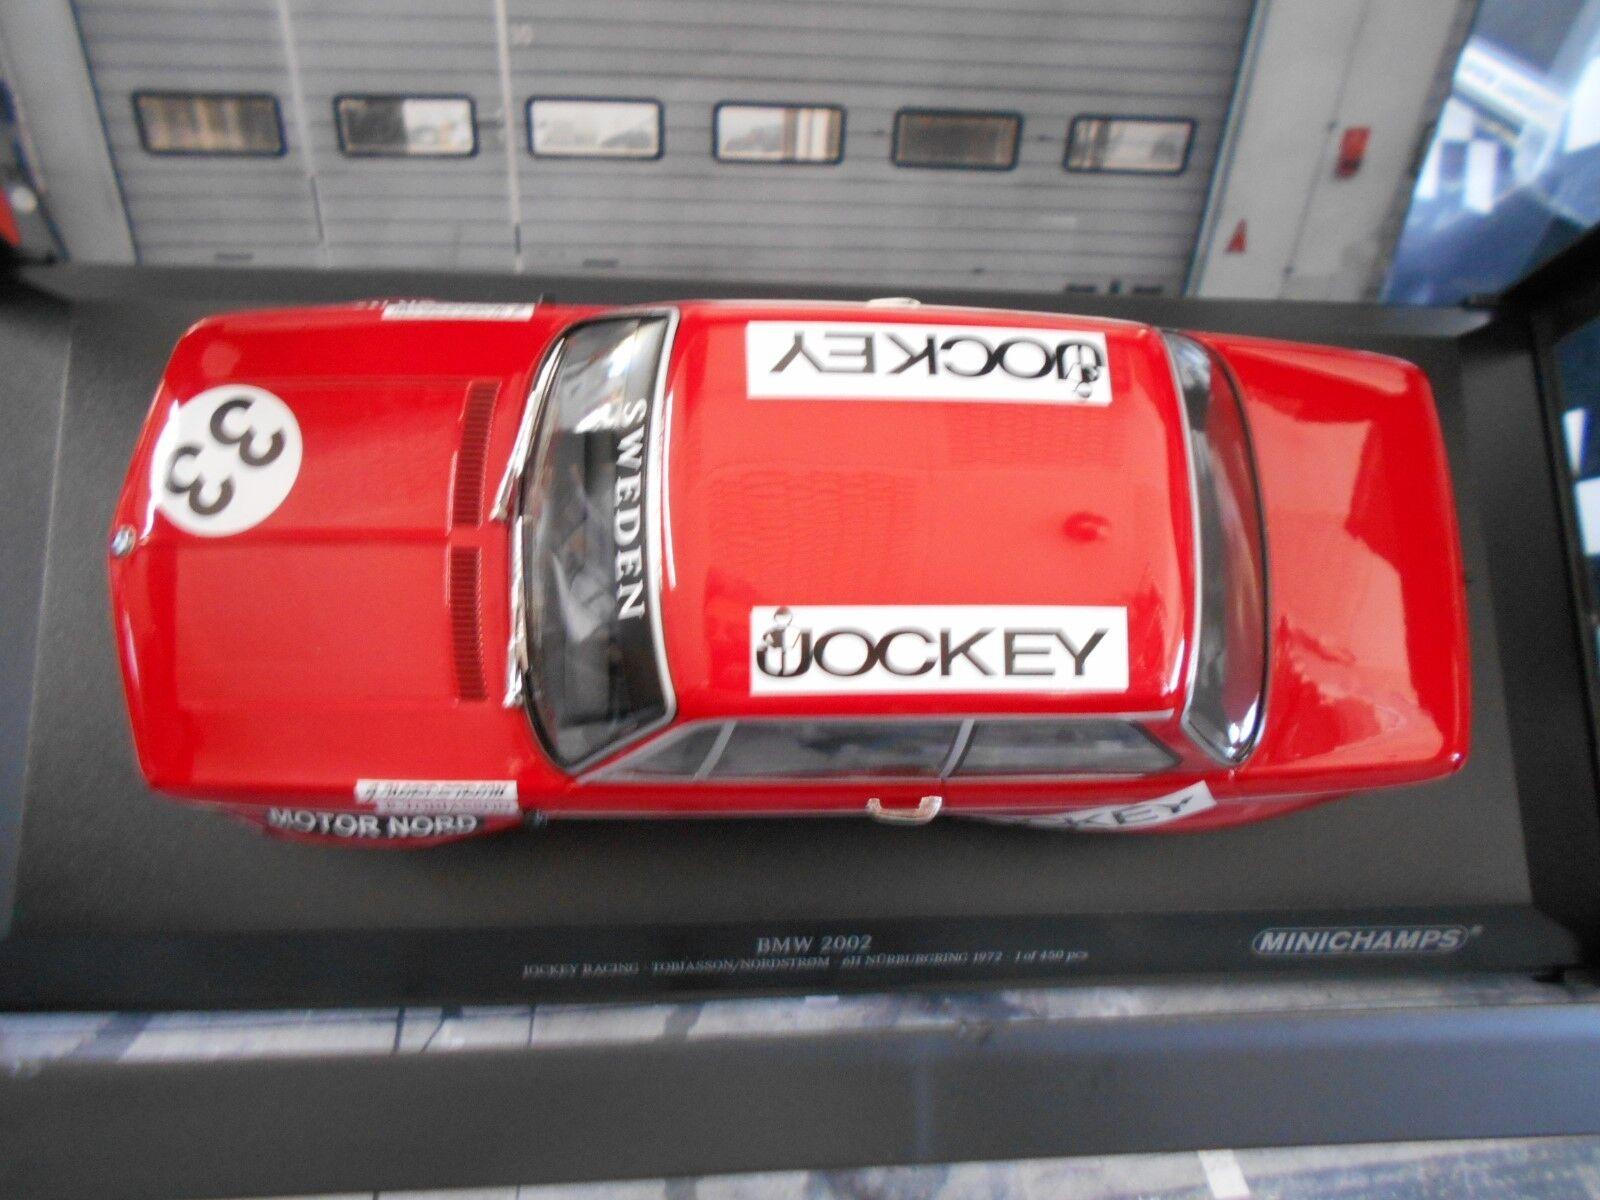 BMW 2002 Jockey Racing #33 Nurburgring tobiasson 1972 tobiasson Nurburgring Nordström MINICHAMPS 1:18 a3f831